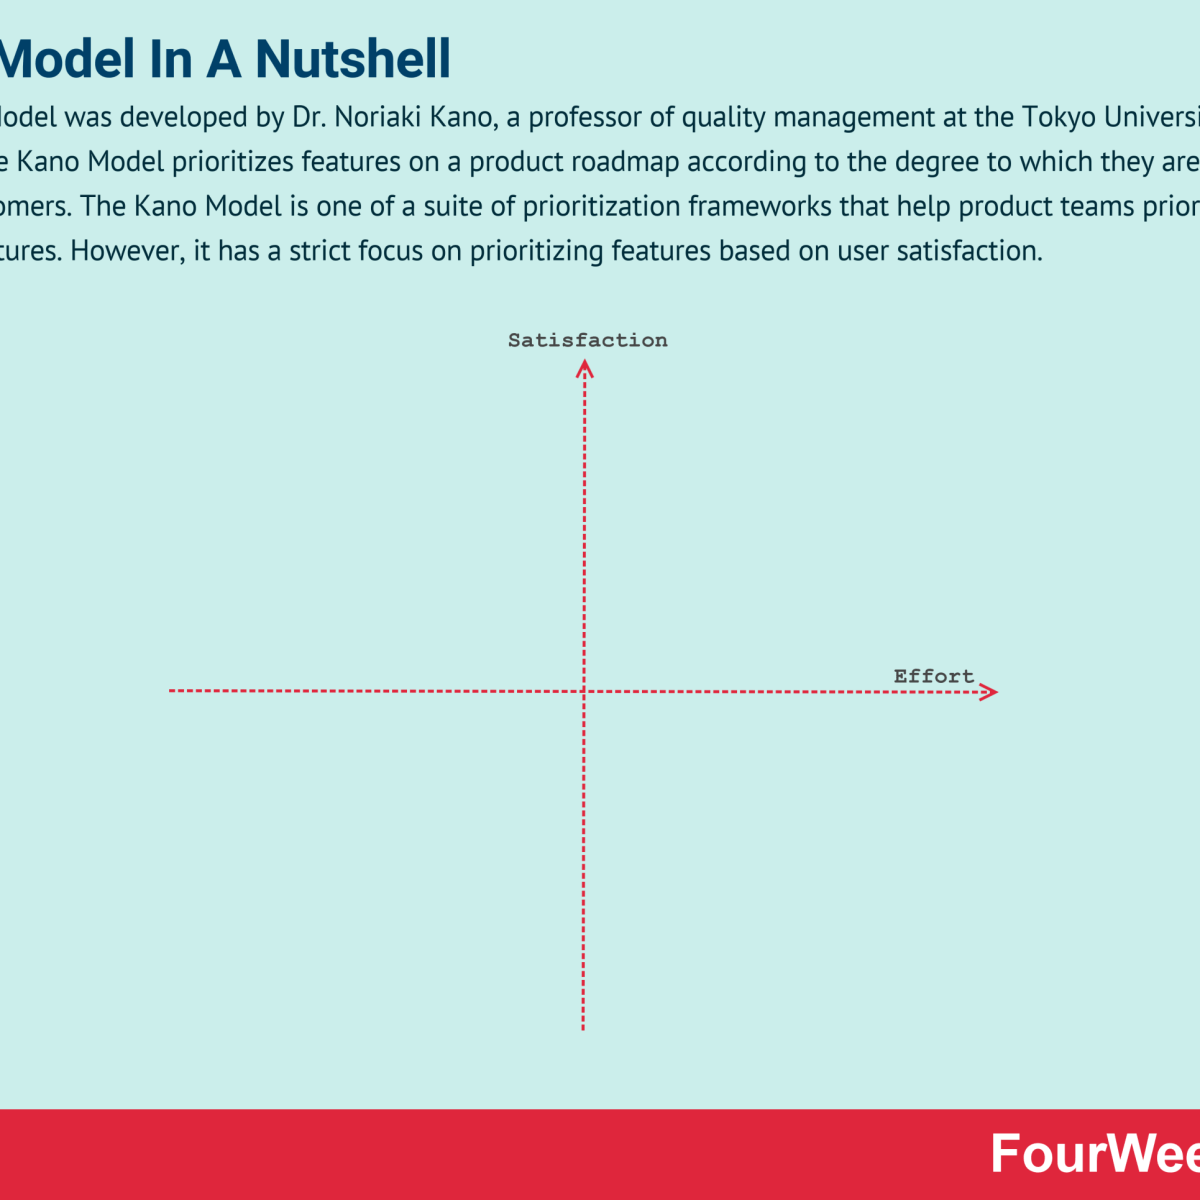 Kano Model Explained For Business